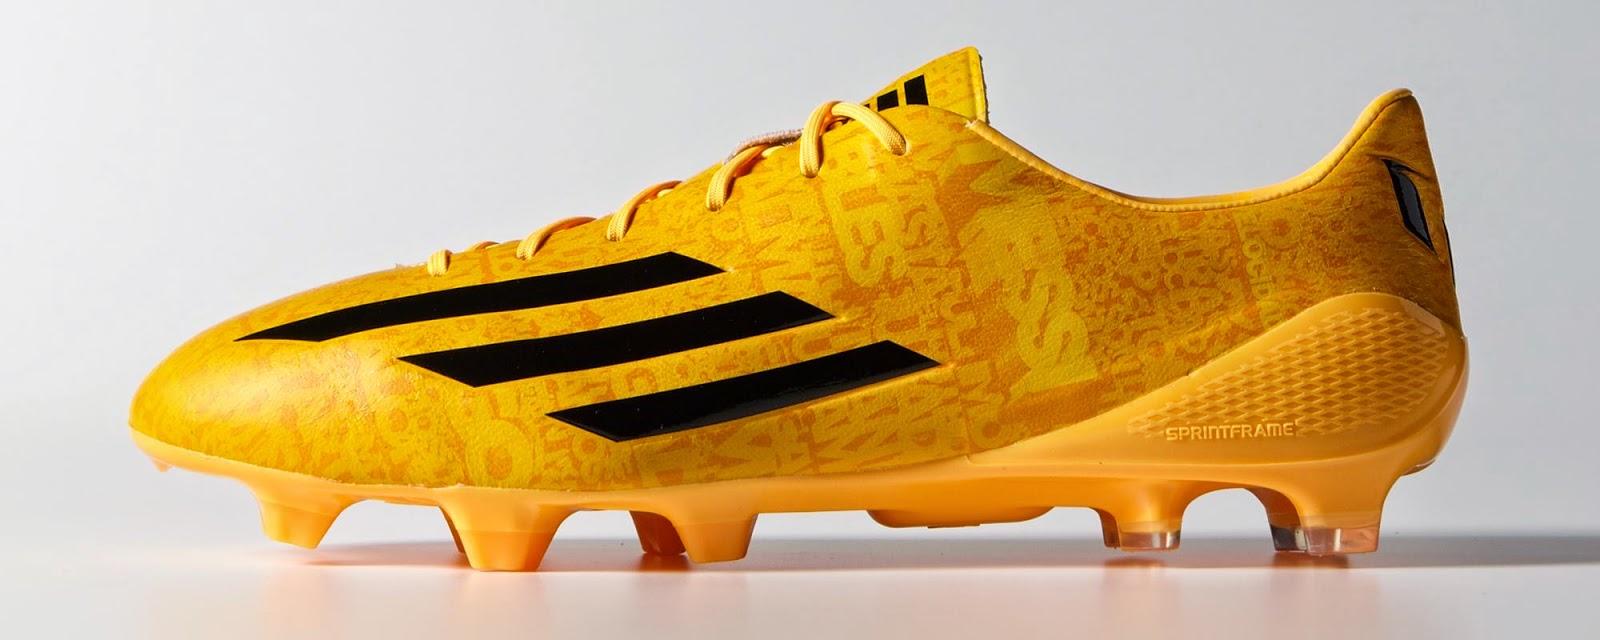 Adidas F50 adiZero 4 Messi Edition - solar gold-black-black - 1.jpg